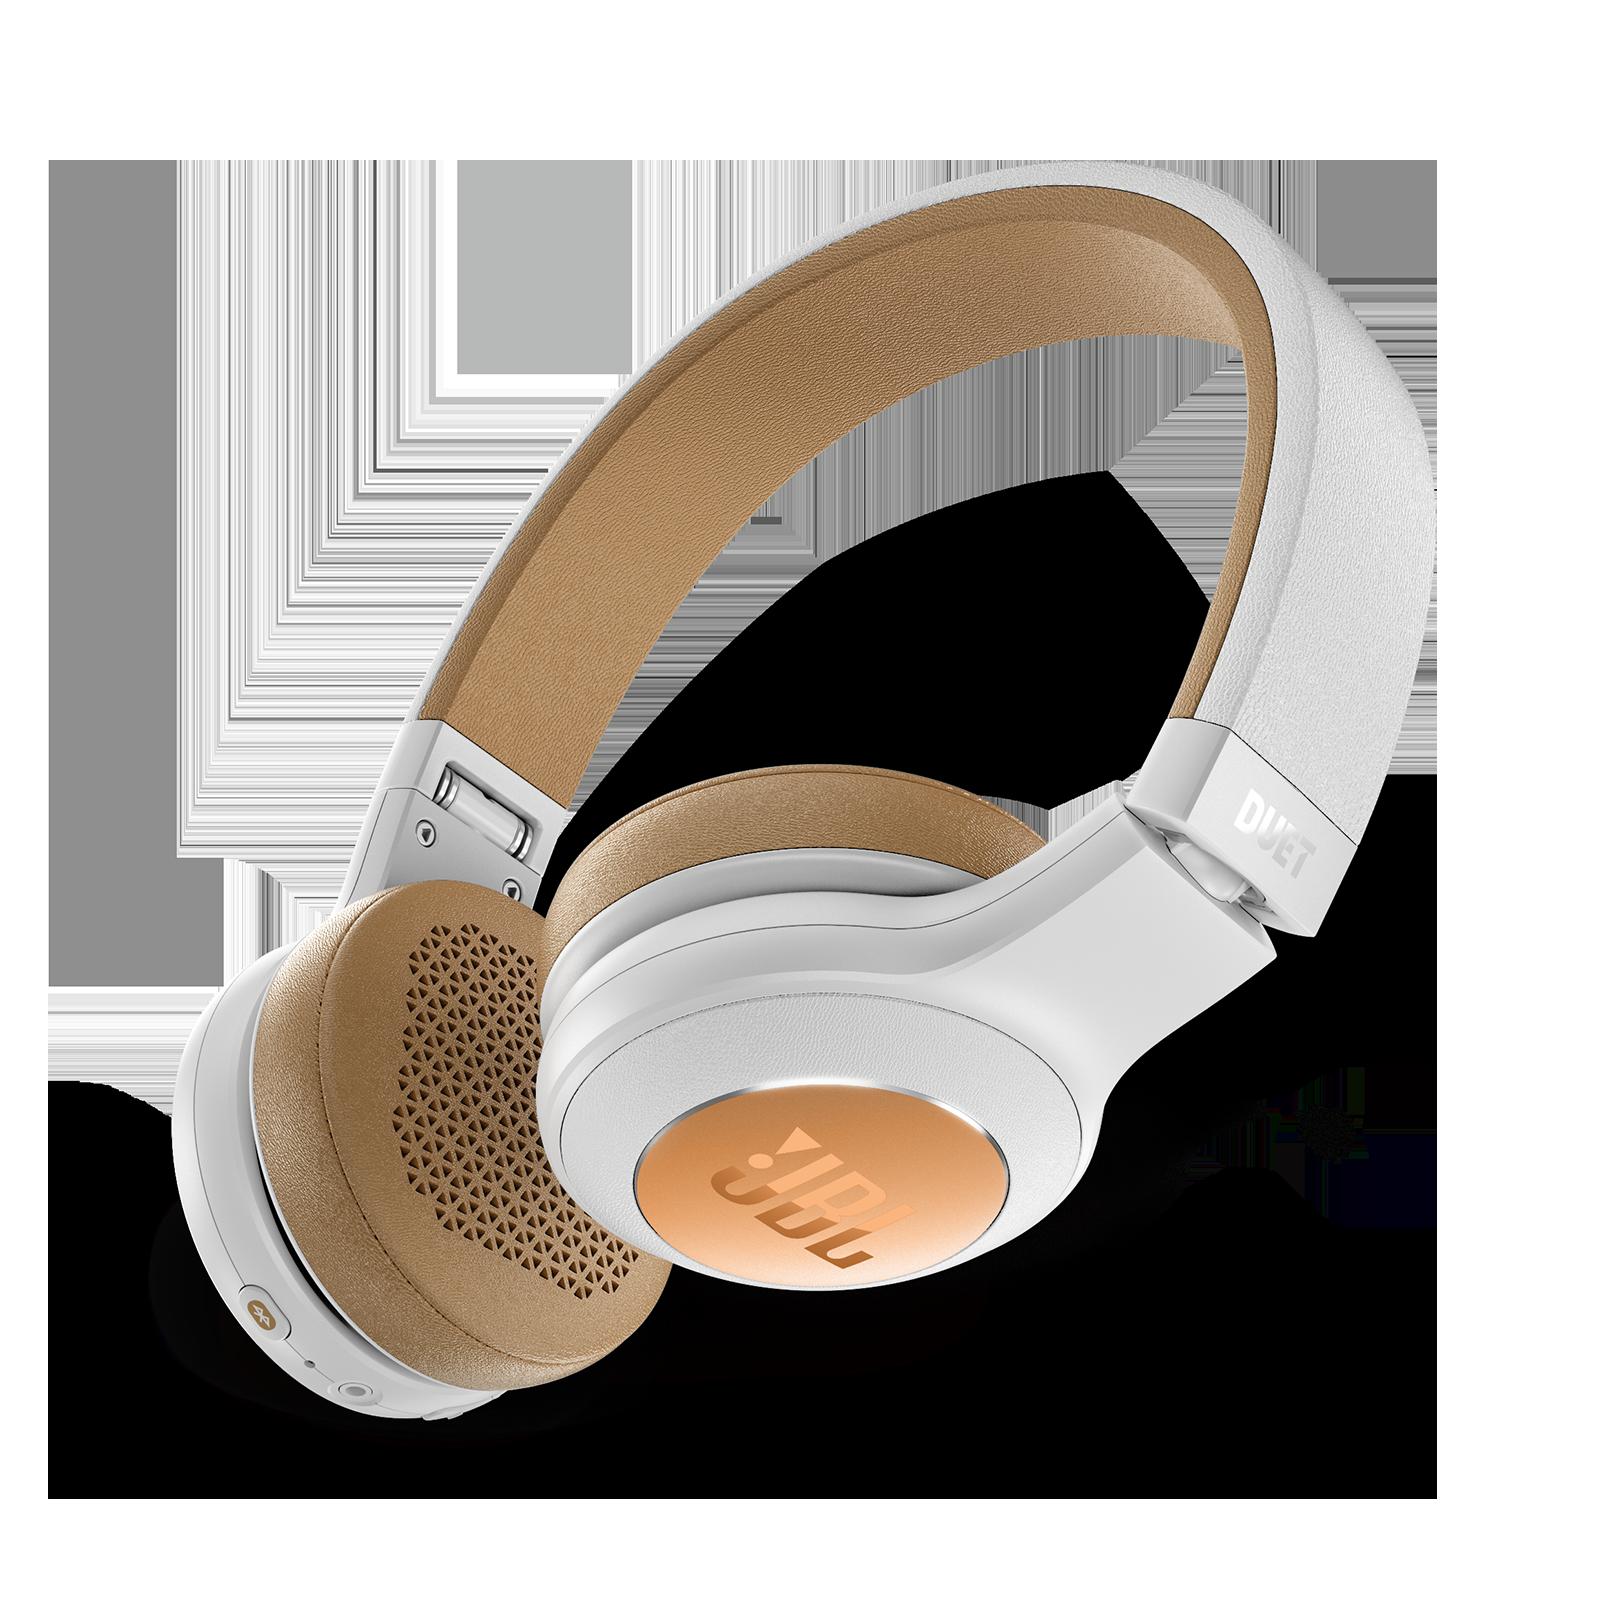 JBL Duet BT - Silver - Wireless on-ear headphones - Detailshot 1